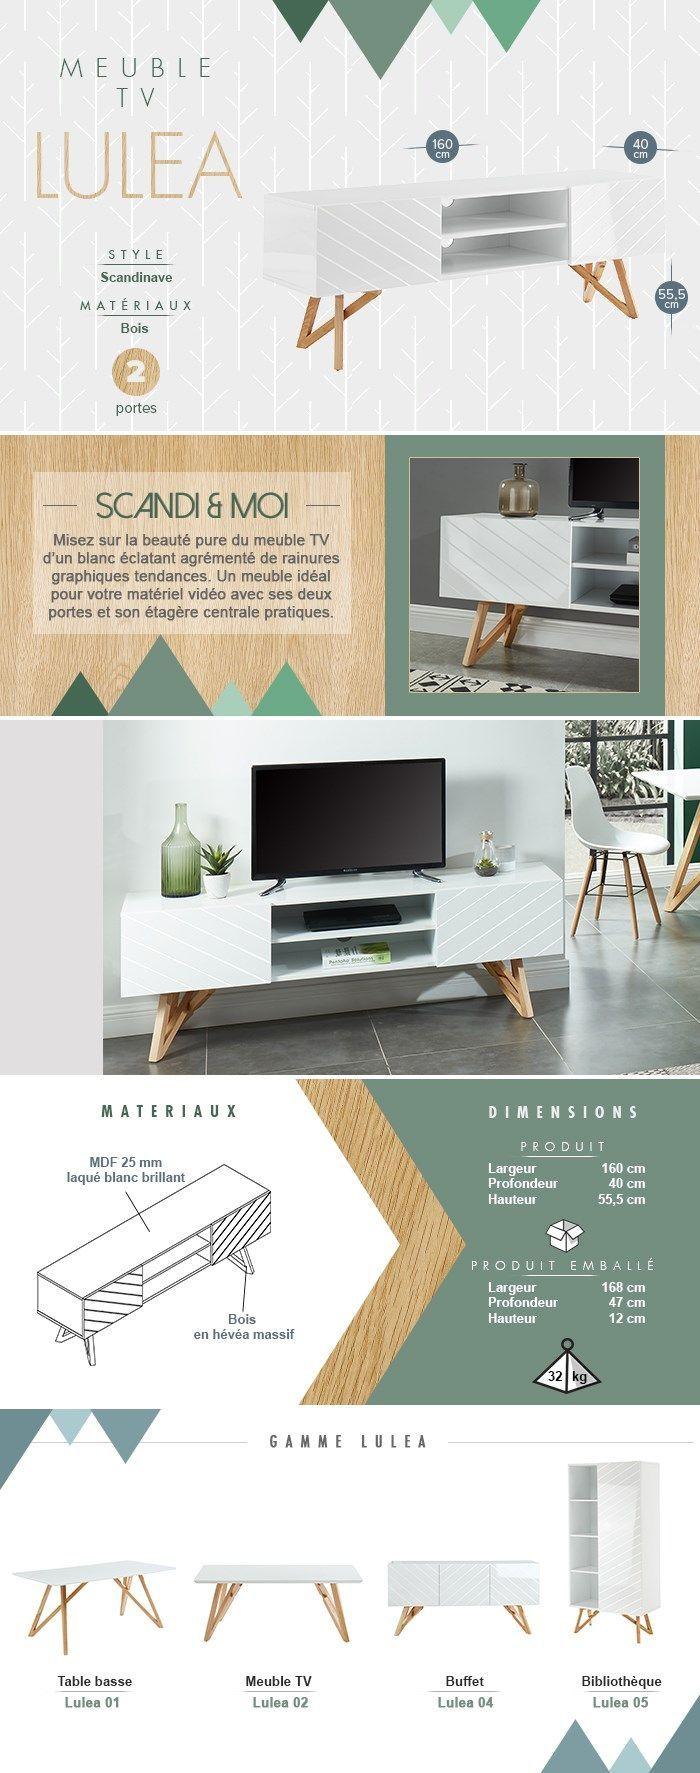 Meuble Tv Scandinave Bois En 2020 Meuble Tv Decoration Meuble Tv Petit Meuble Tv